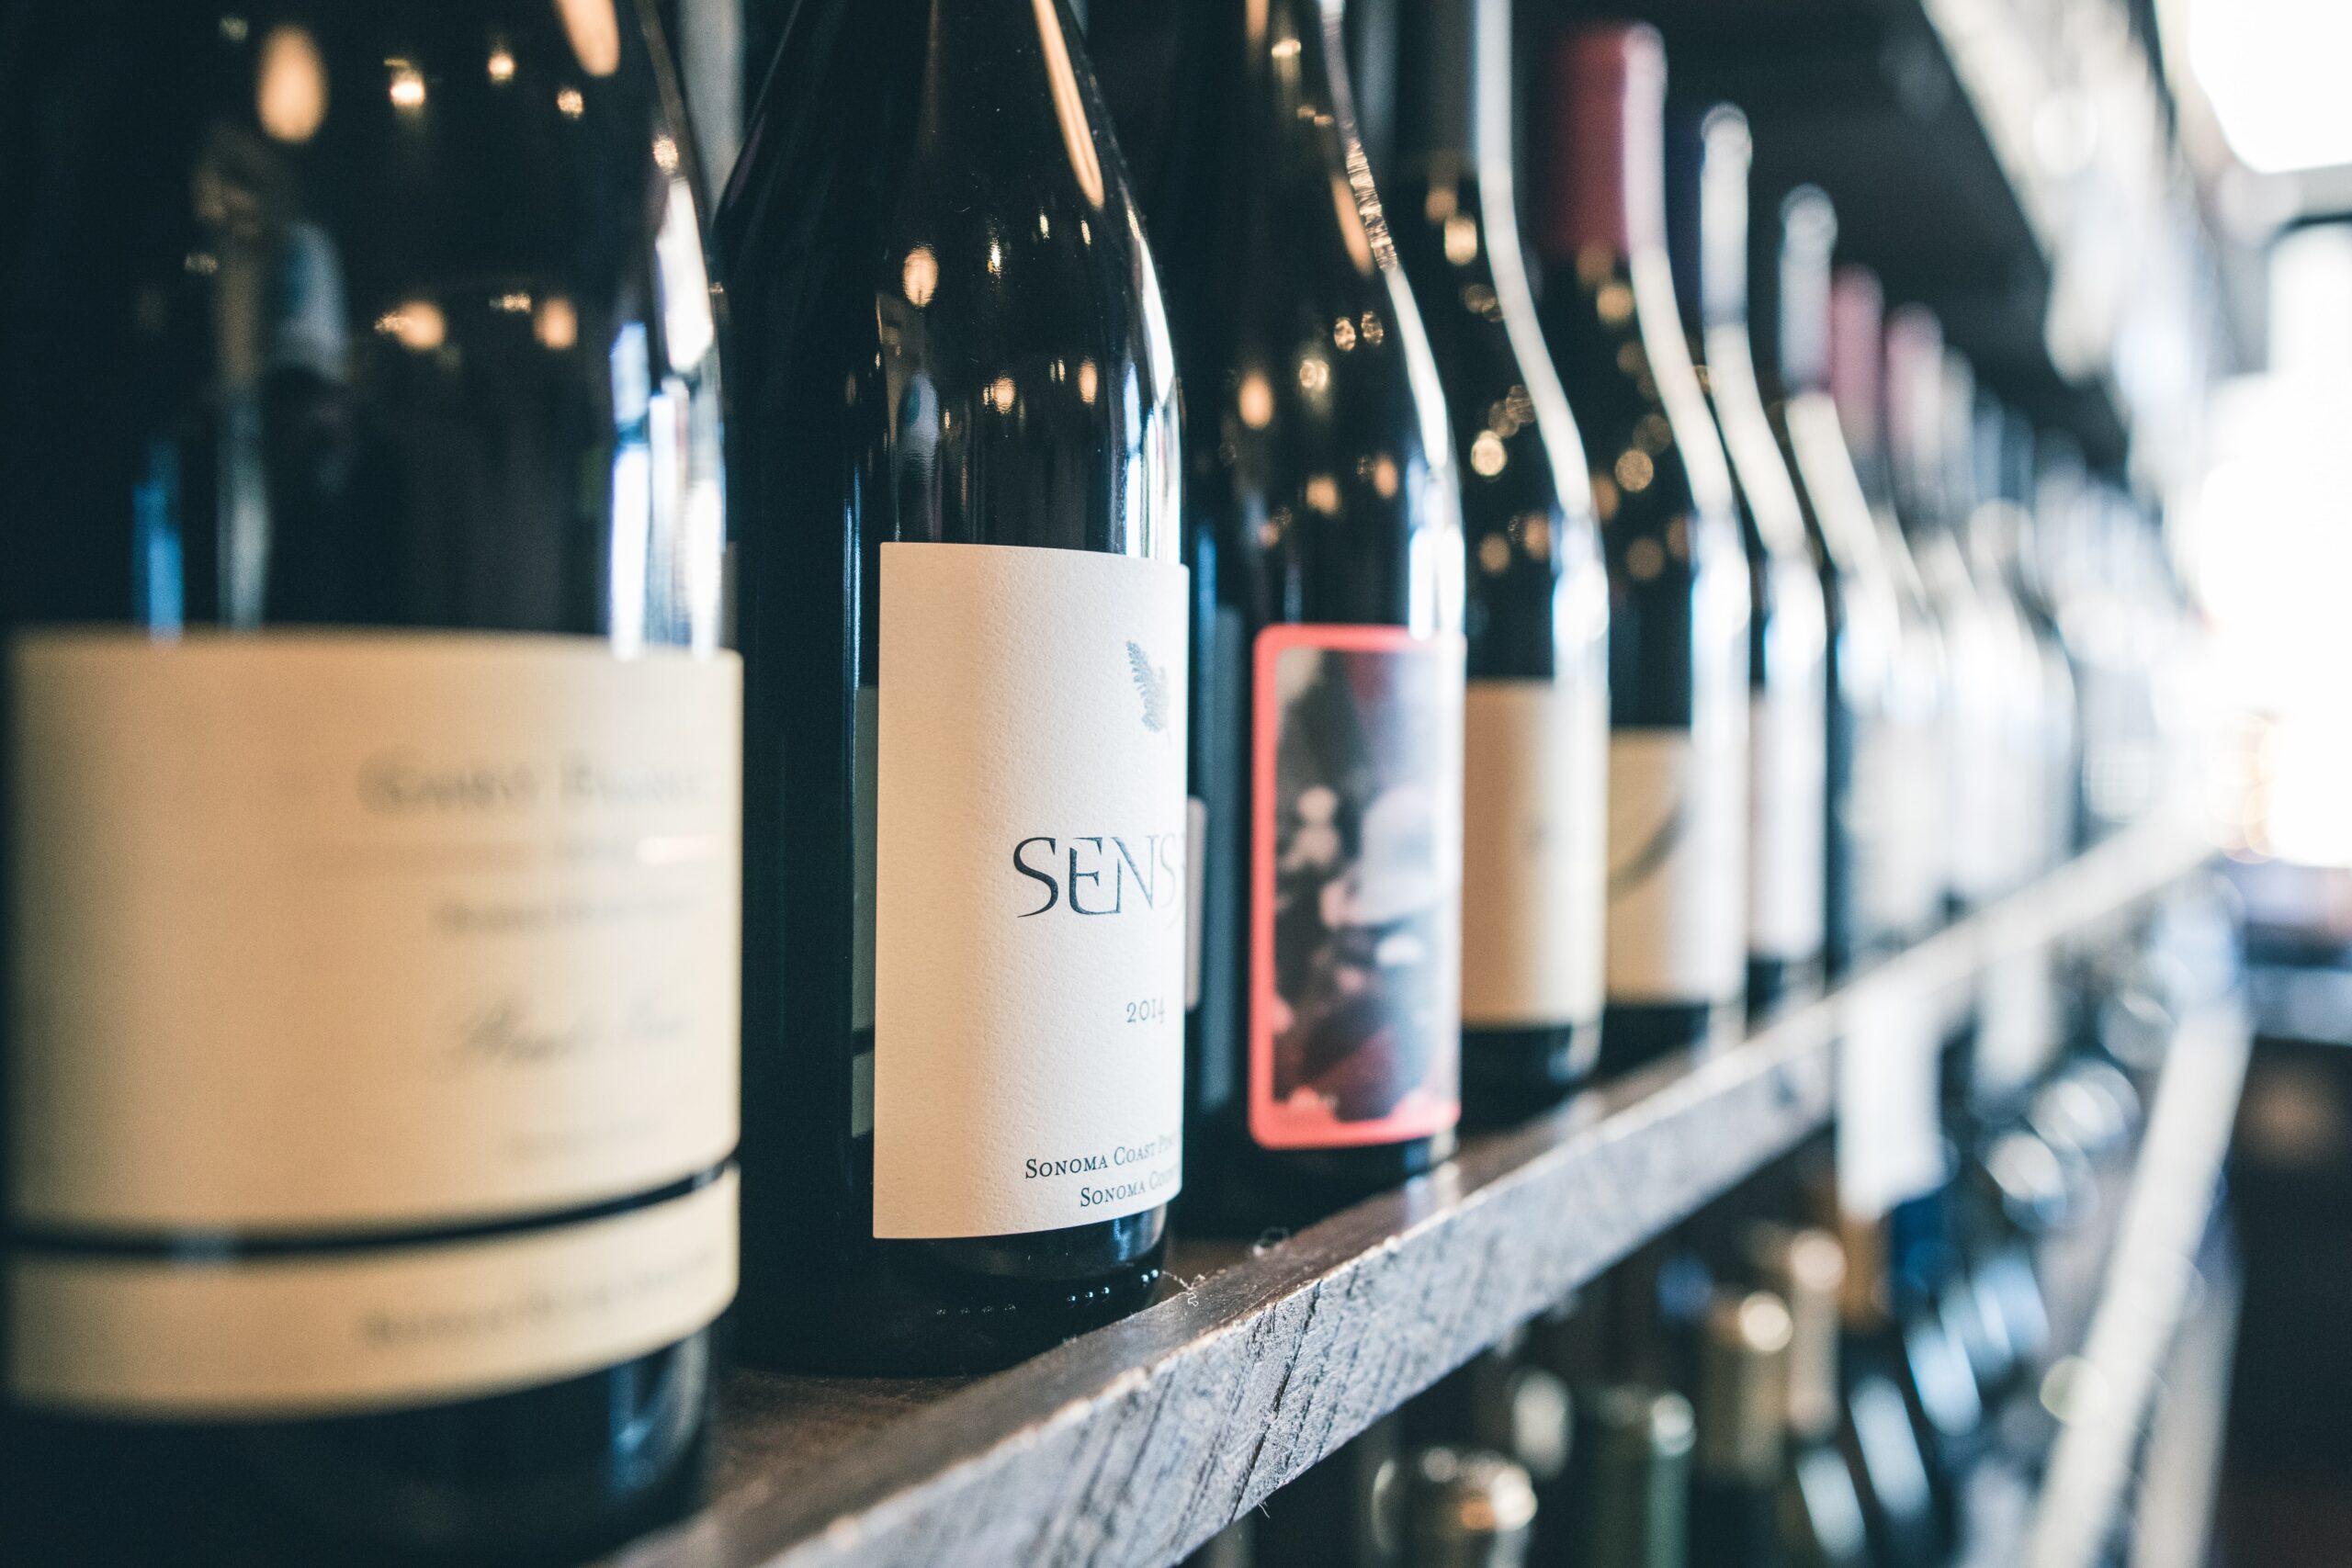 Wine tasting experiences in Bristol